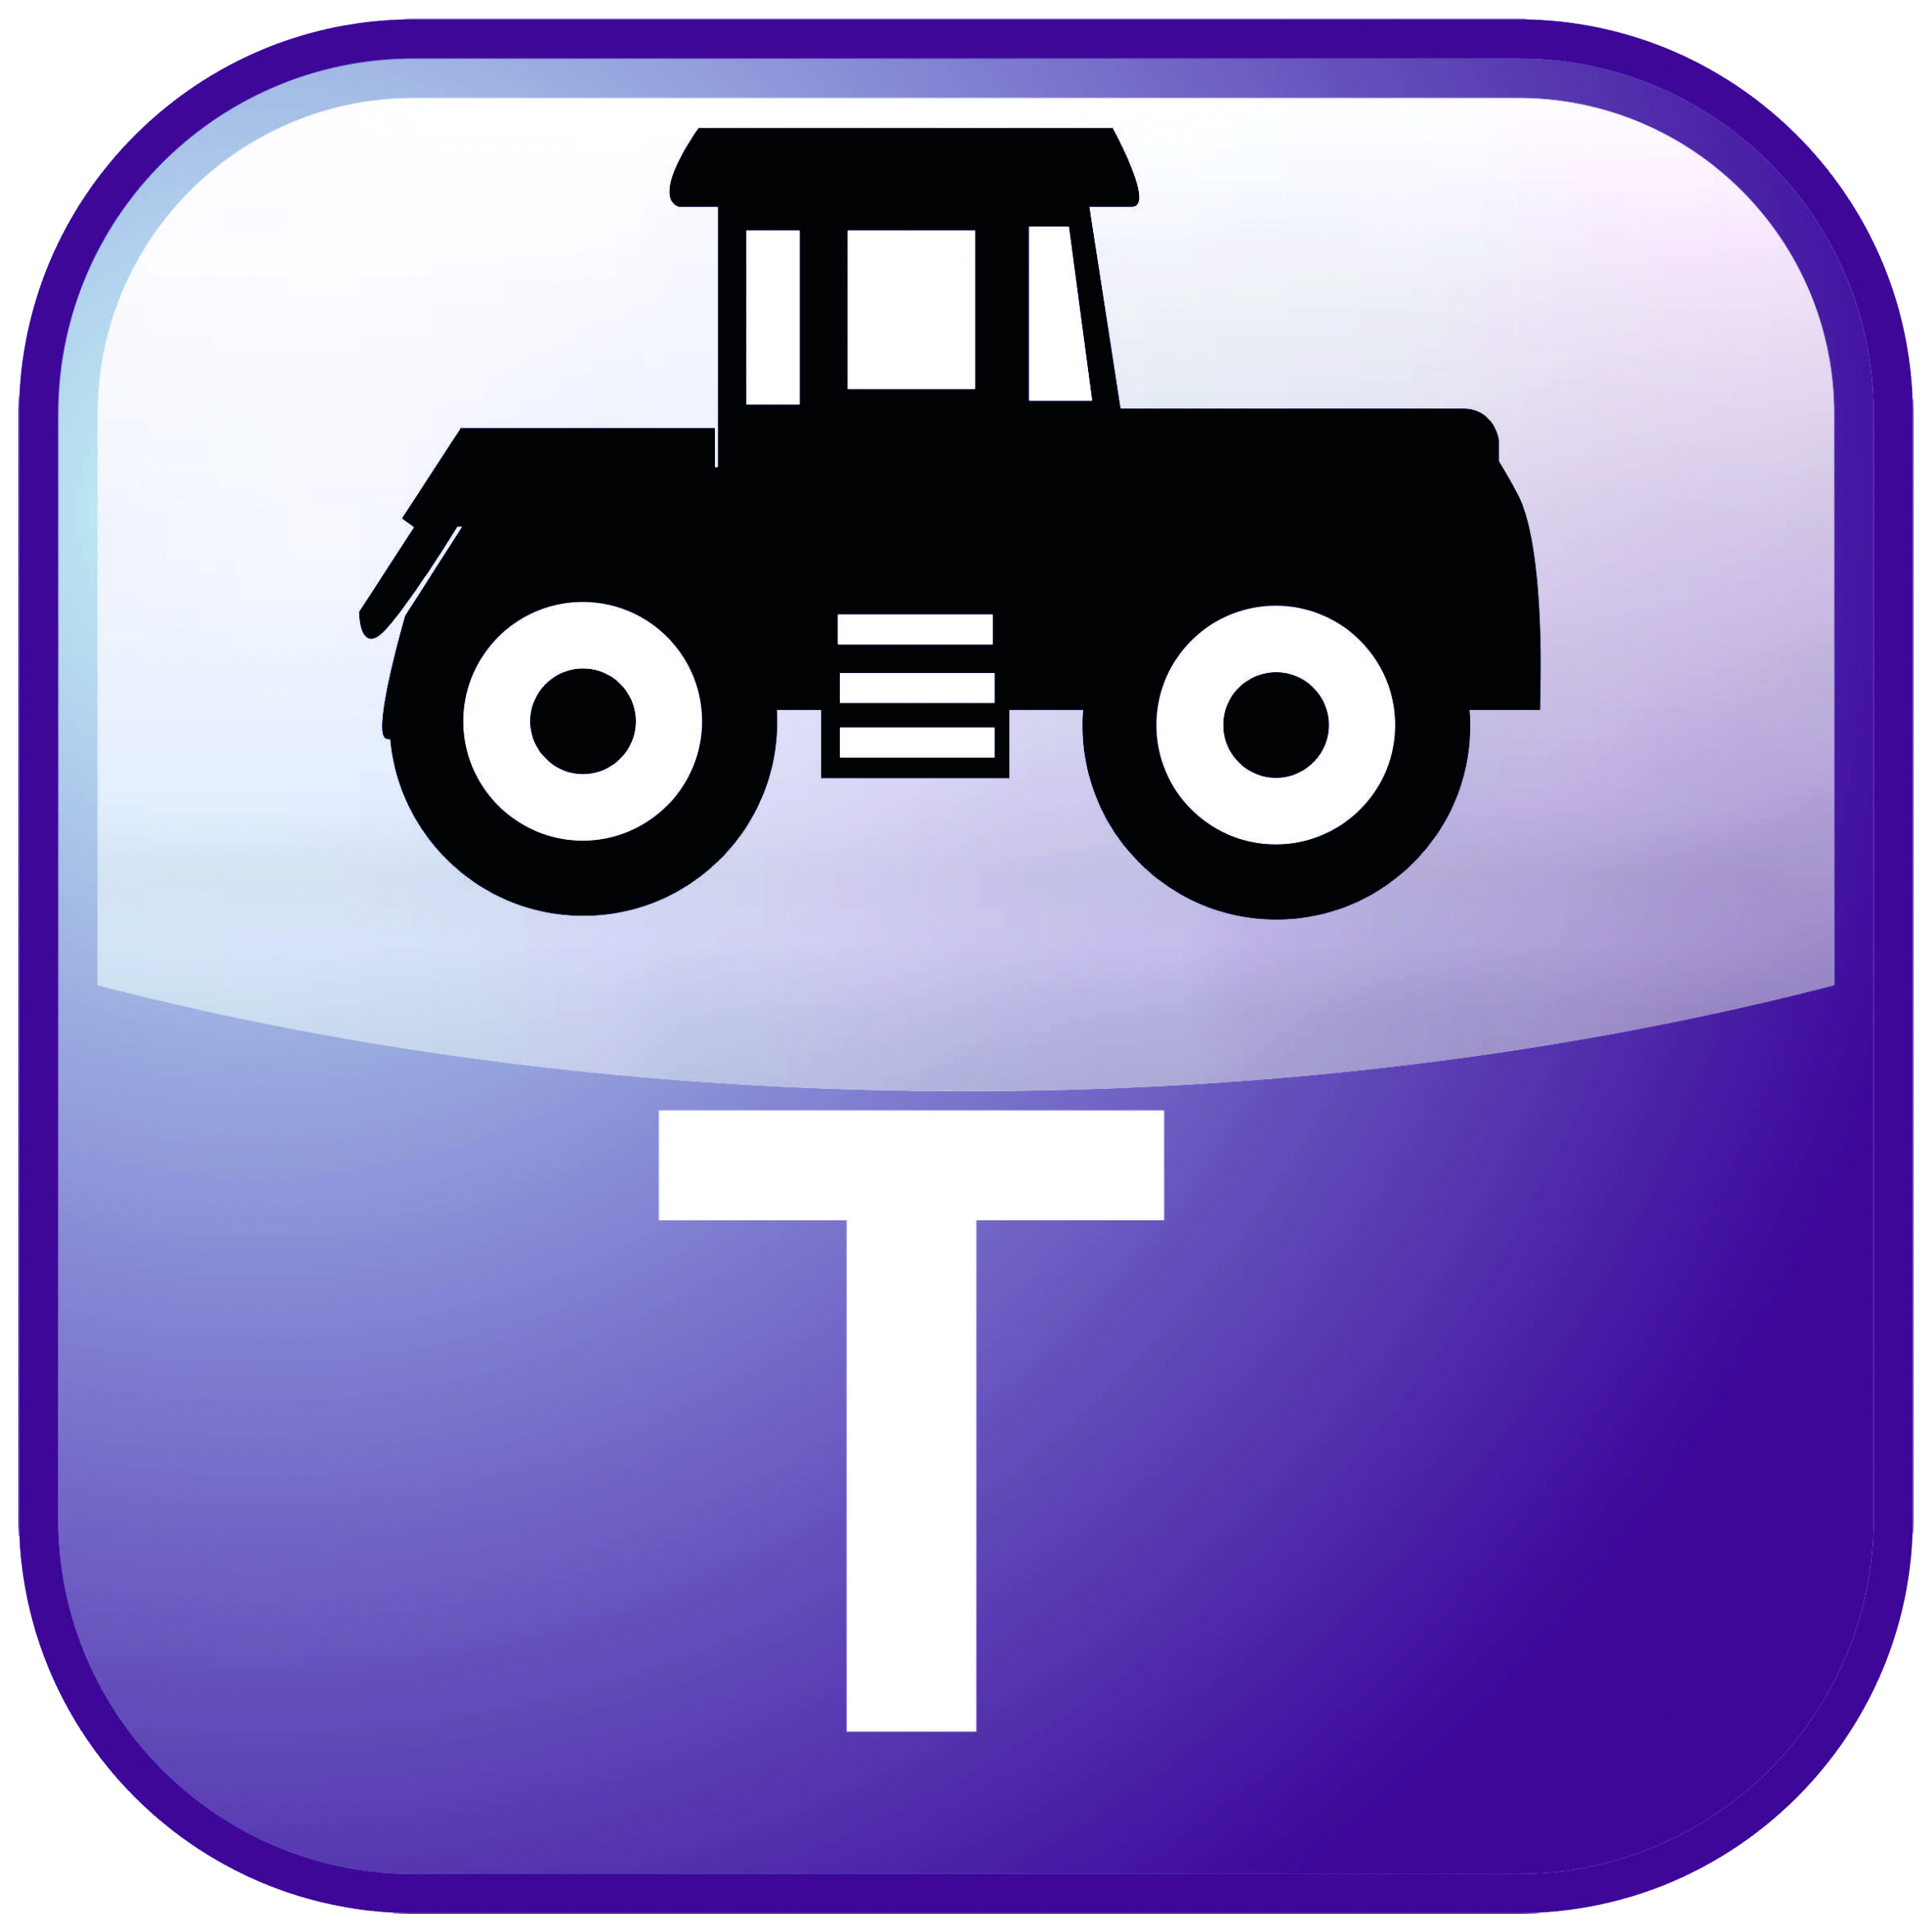 Fahrerlaubnisklasse T